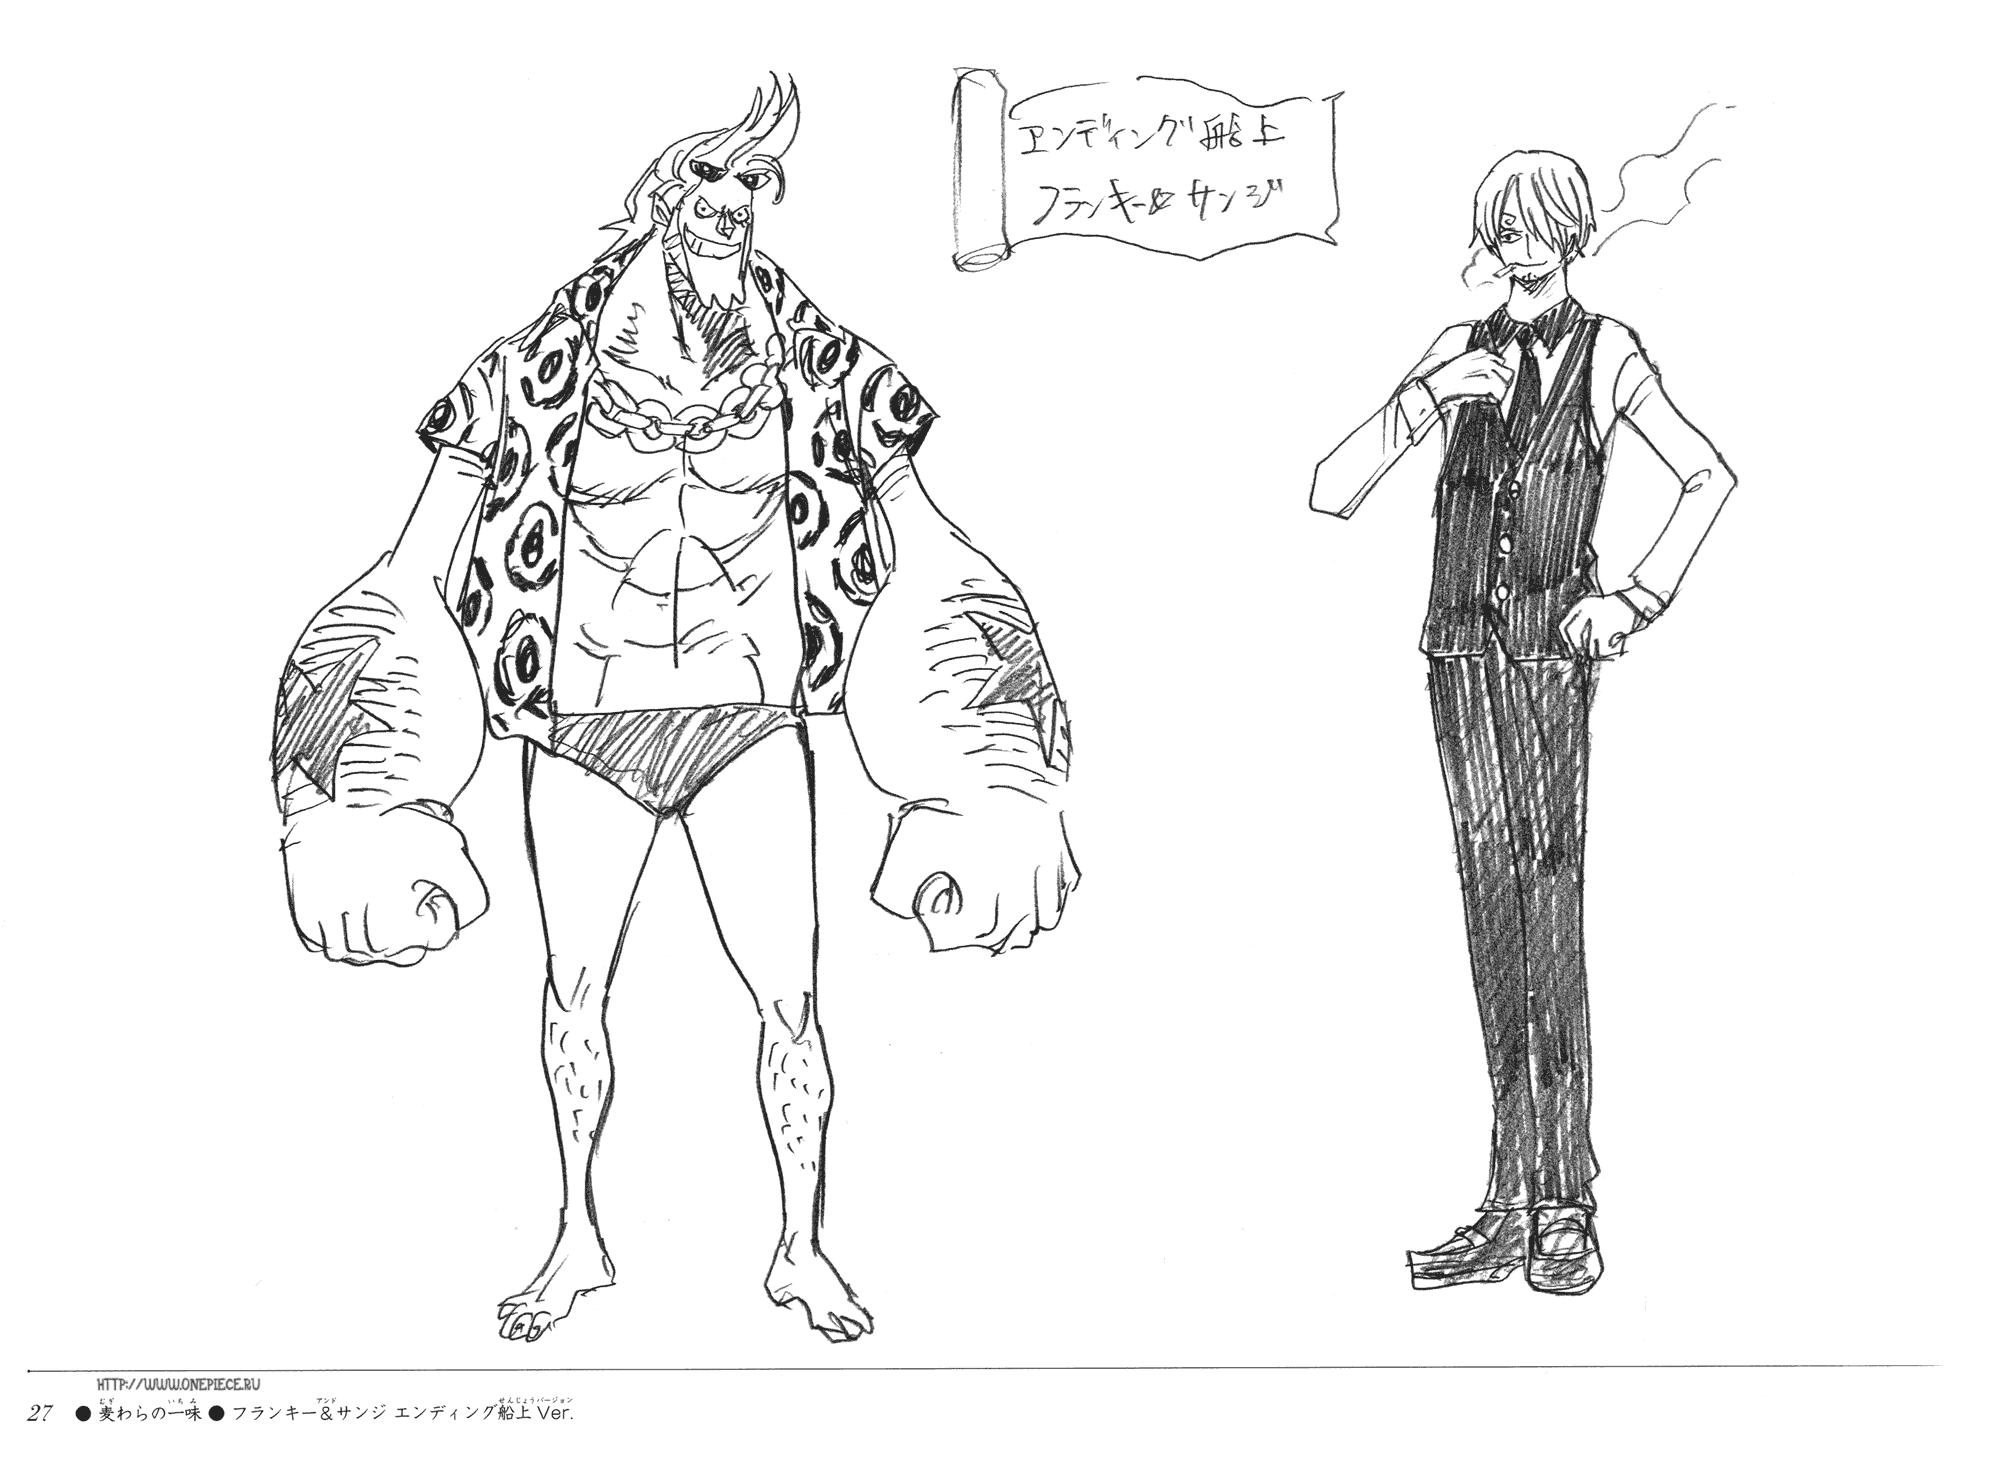 One Piece Lineart : Strong world eiichiro oda artbook zerochan anime image board